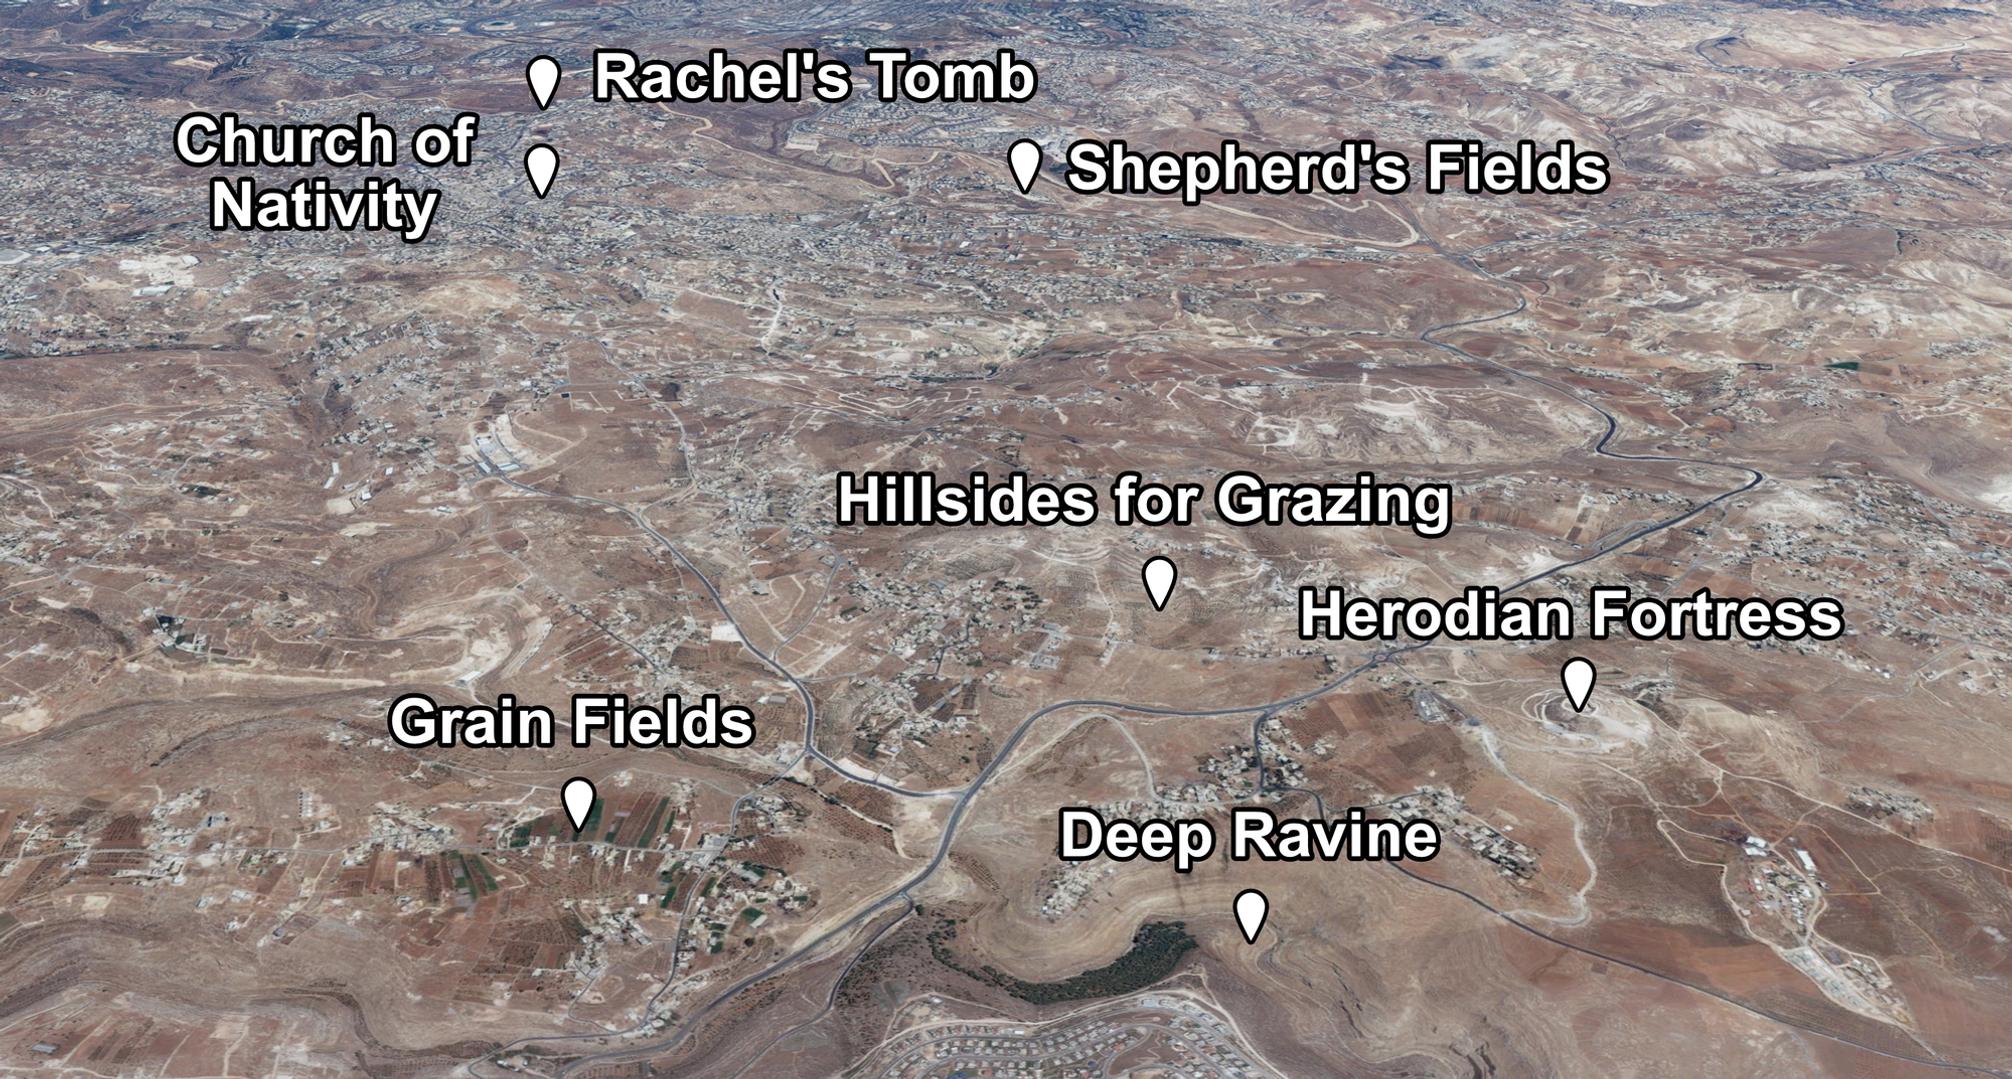 Bethlehem Overview Places of Interest.pn